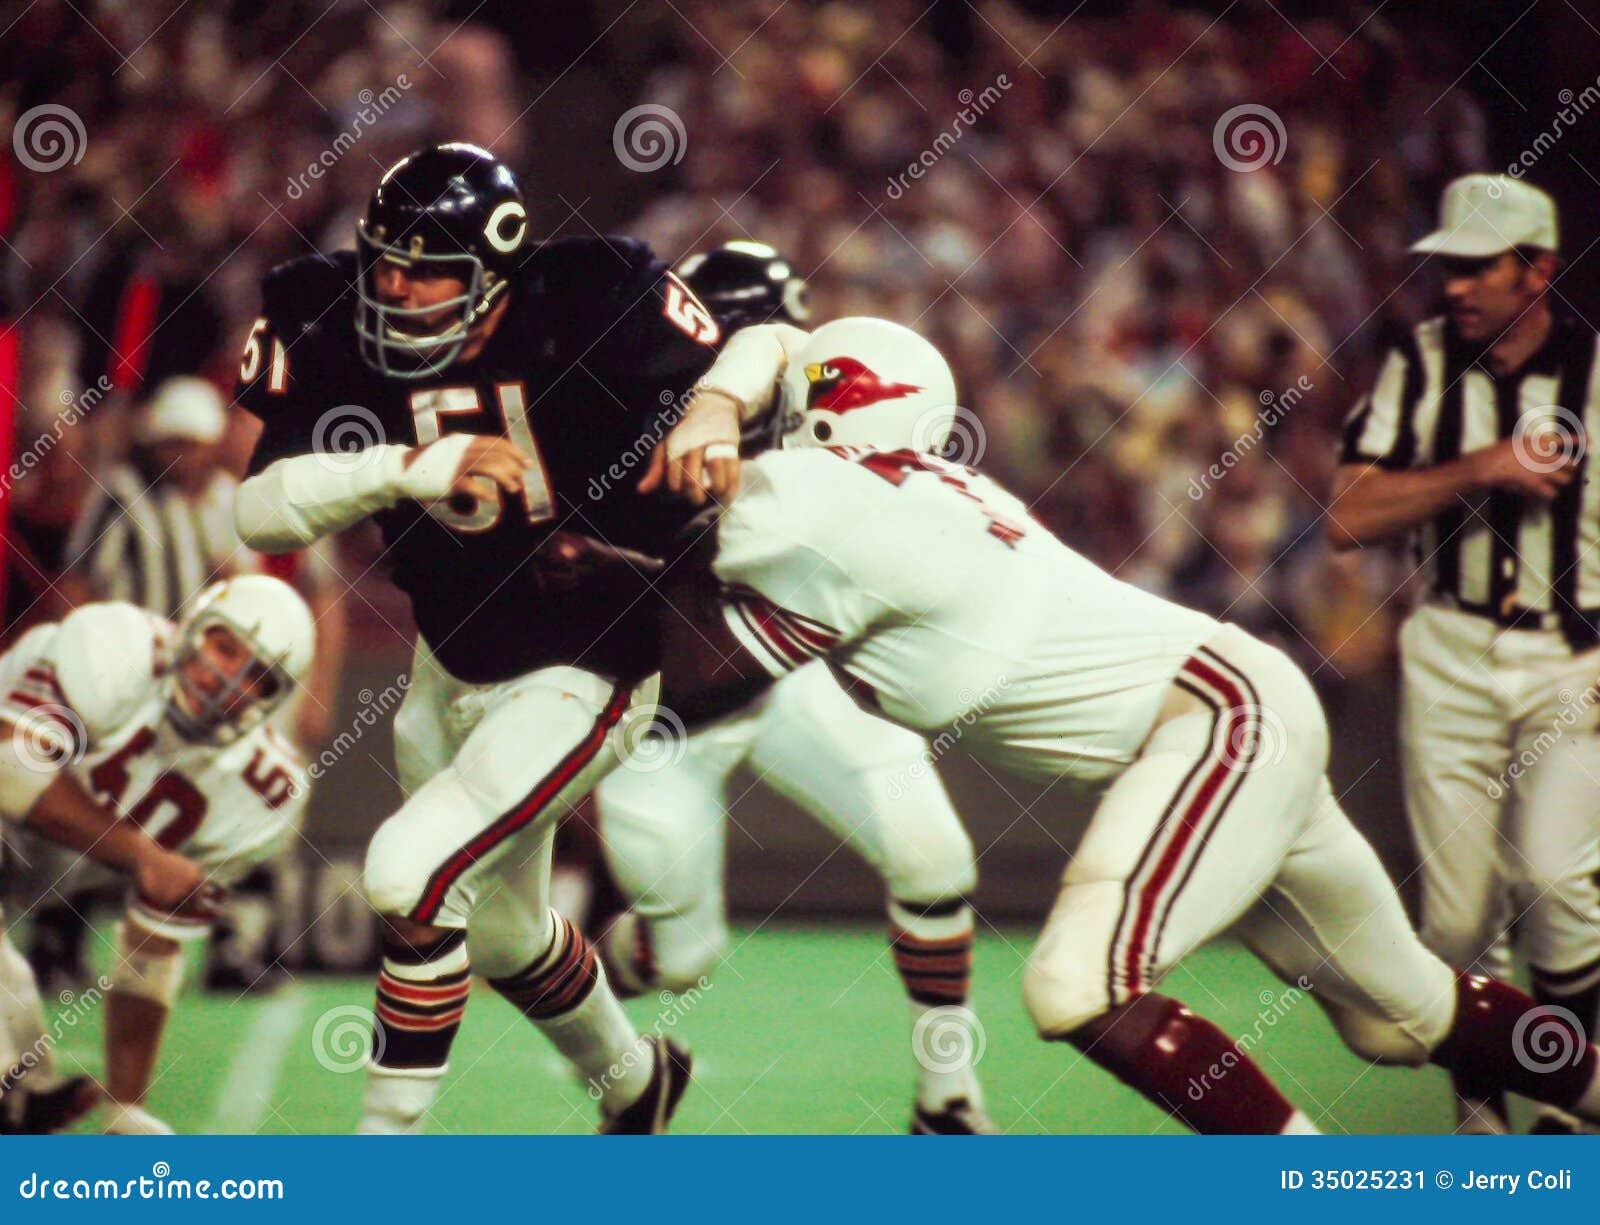 Dick Butkus Chicago Bears